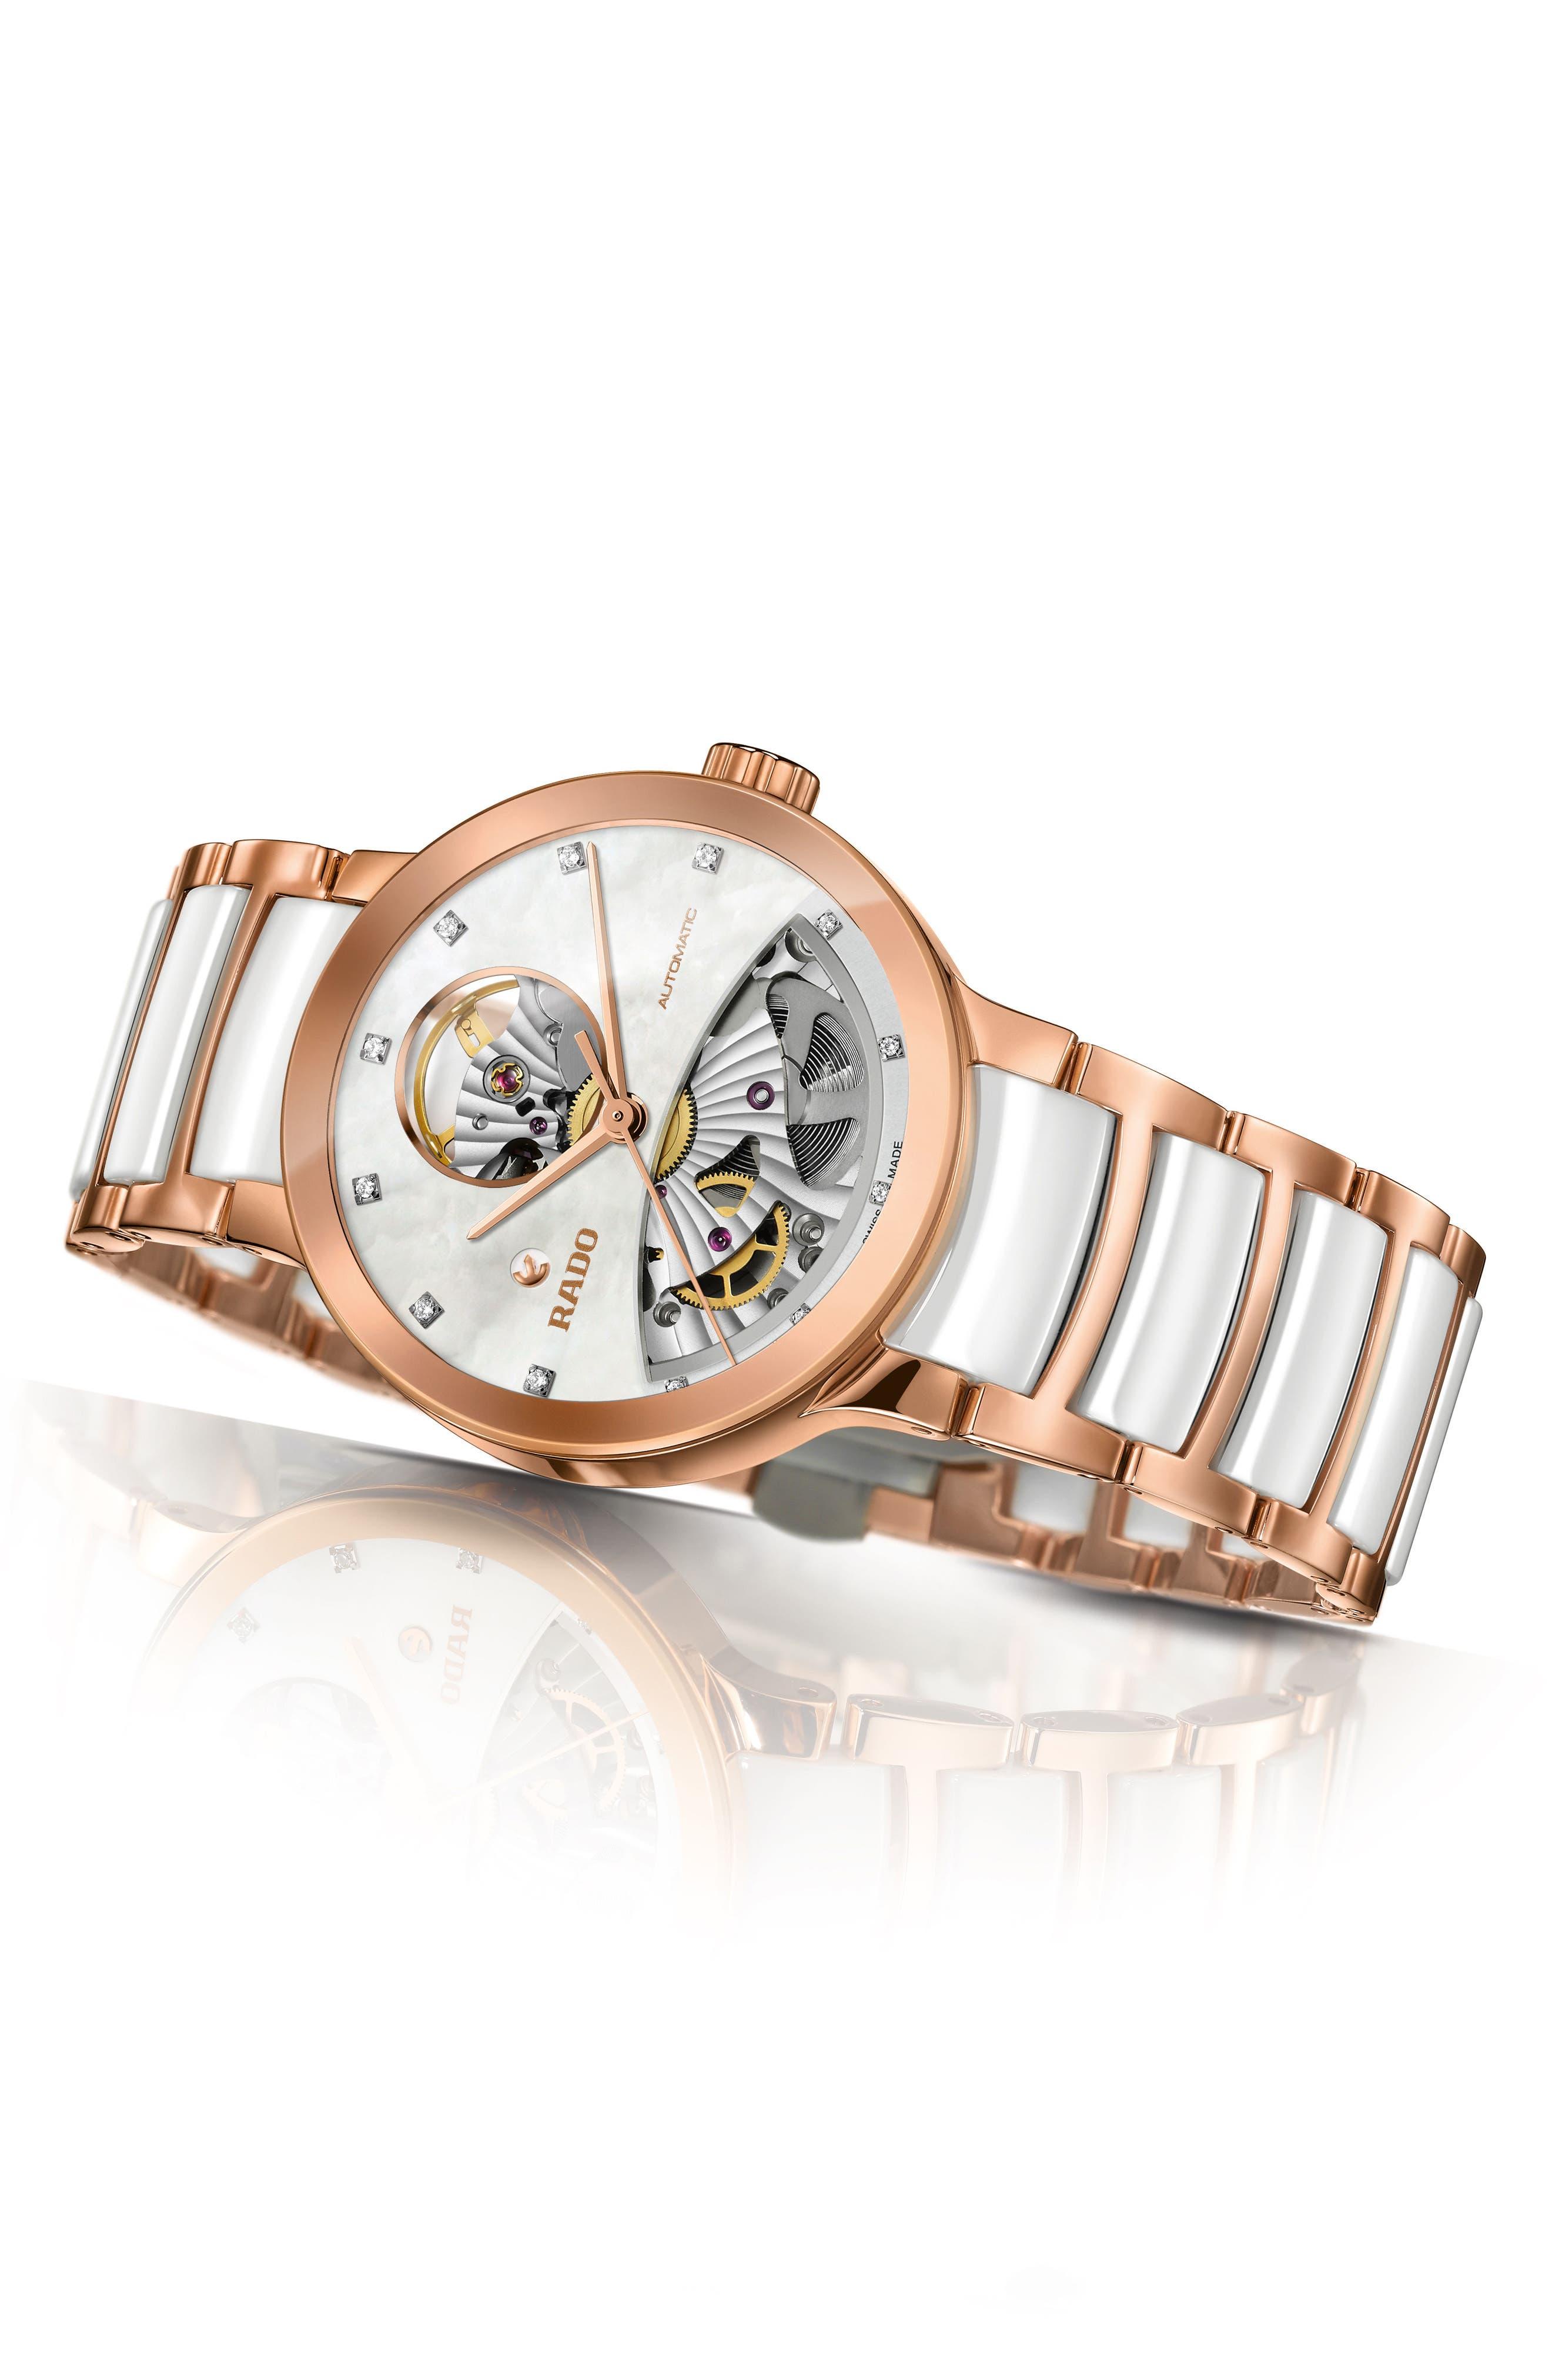 Centrix Open Heart Automatic Diamond Ceramic Bracelet Watch, 33mm,                             Alternate thumbnail 5, color,                             White/ Mop/ Rose Gold